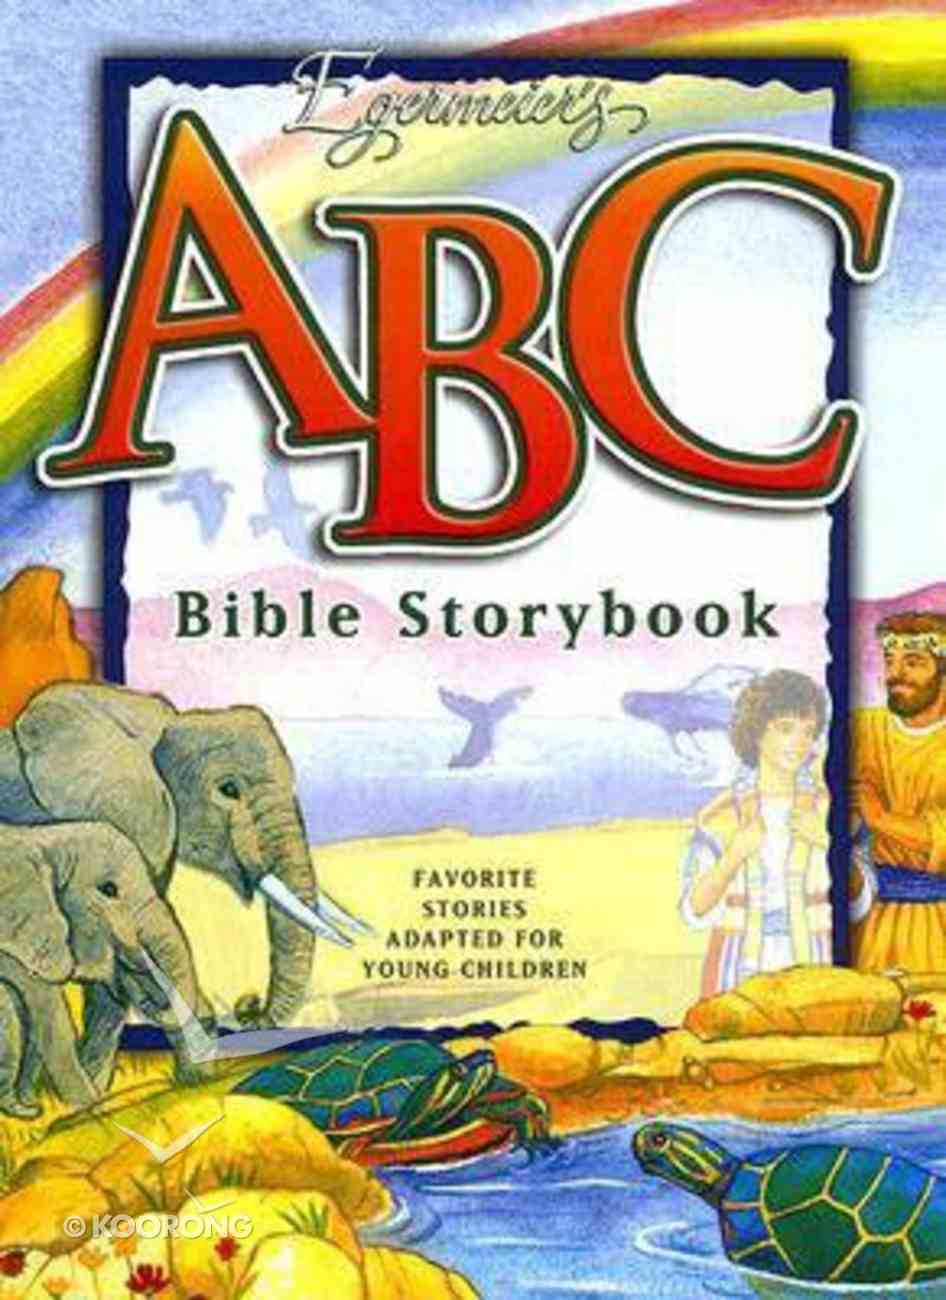 Egermeier's ABC Bible Storybook Hardback